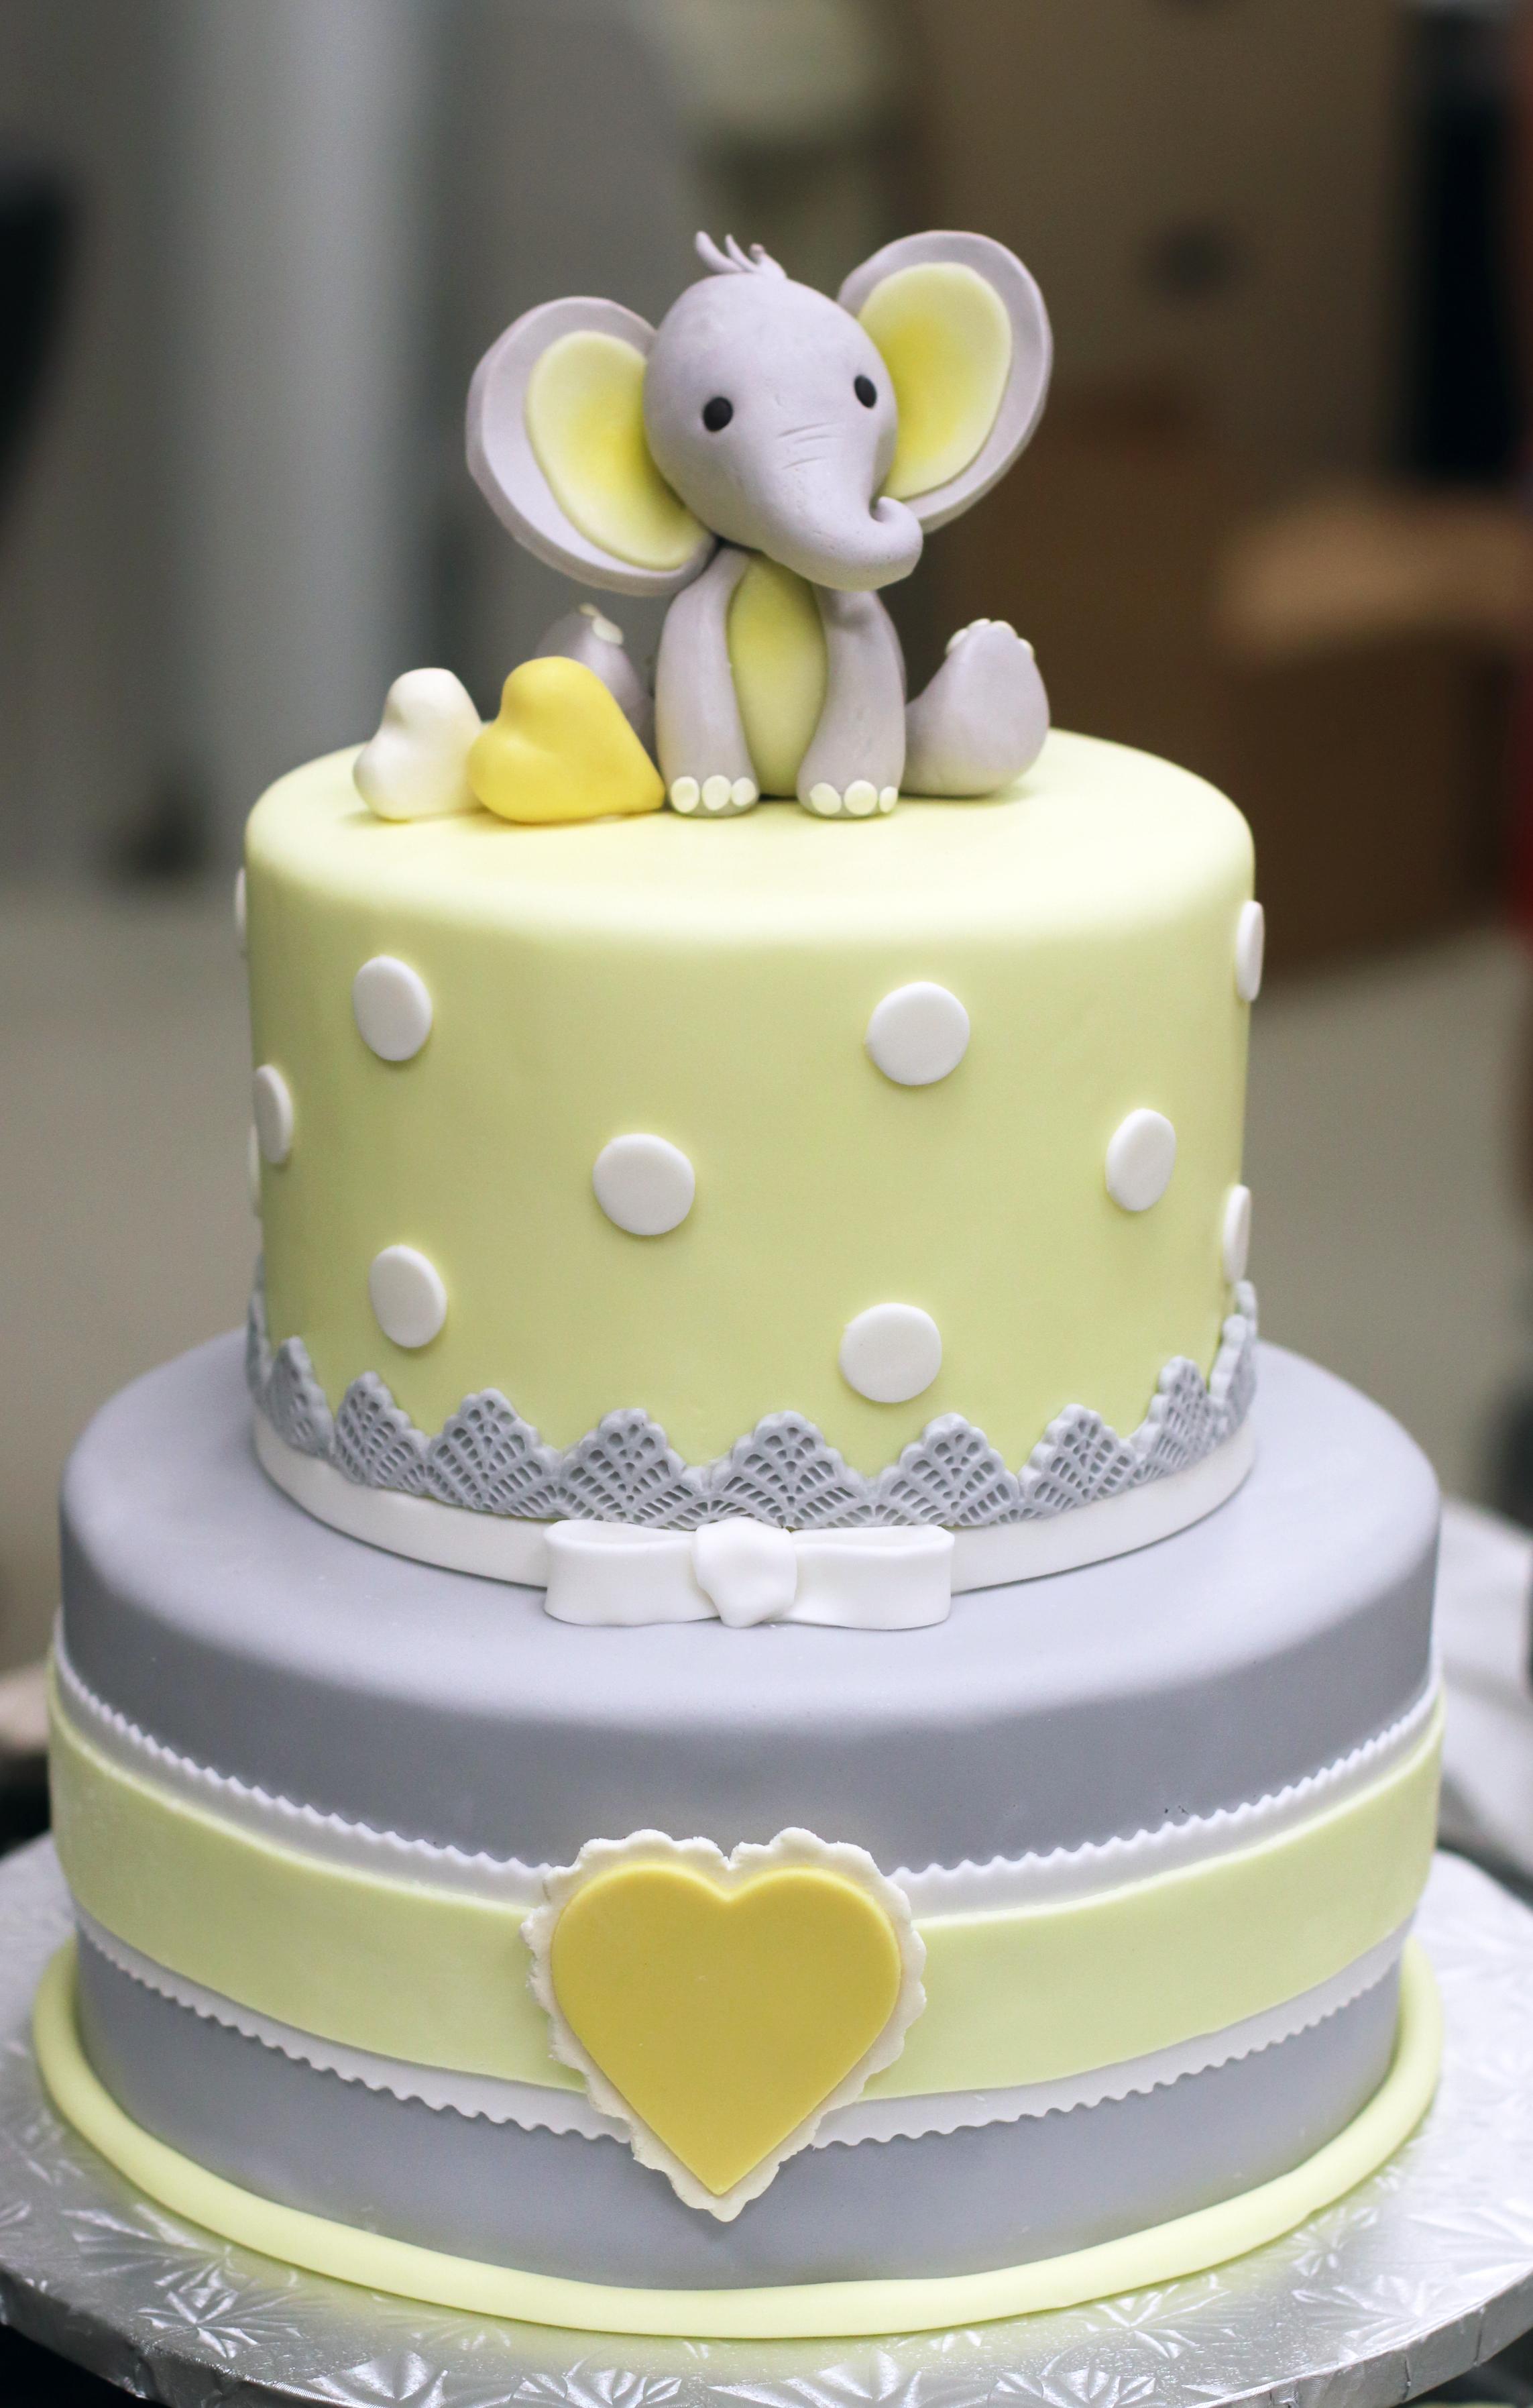 Amazing Custom Baby Shower Cakes Nj For Boys Girls Twins